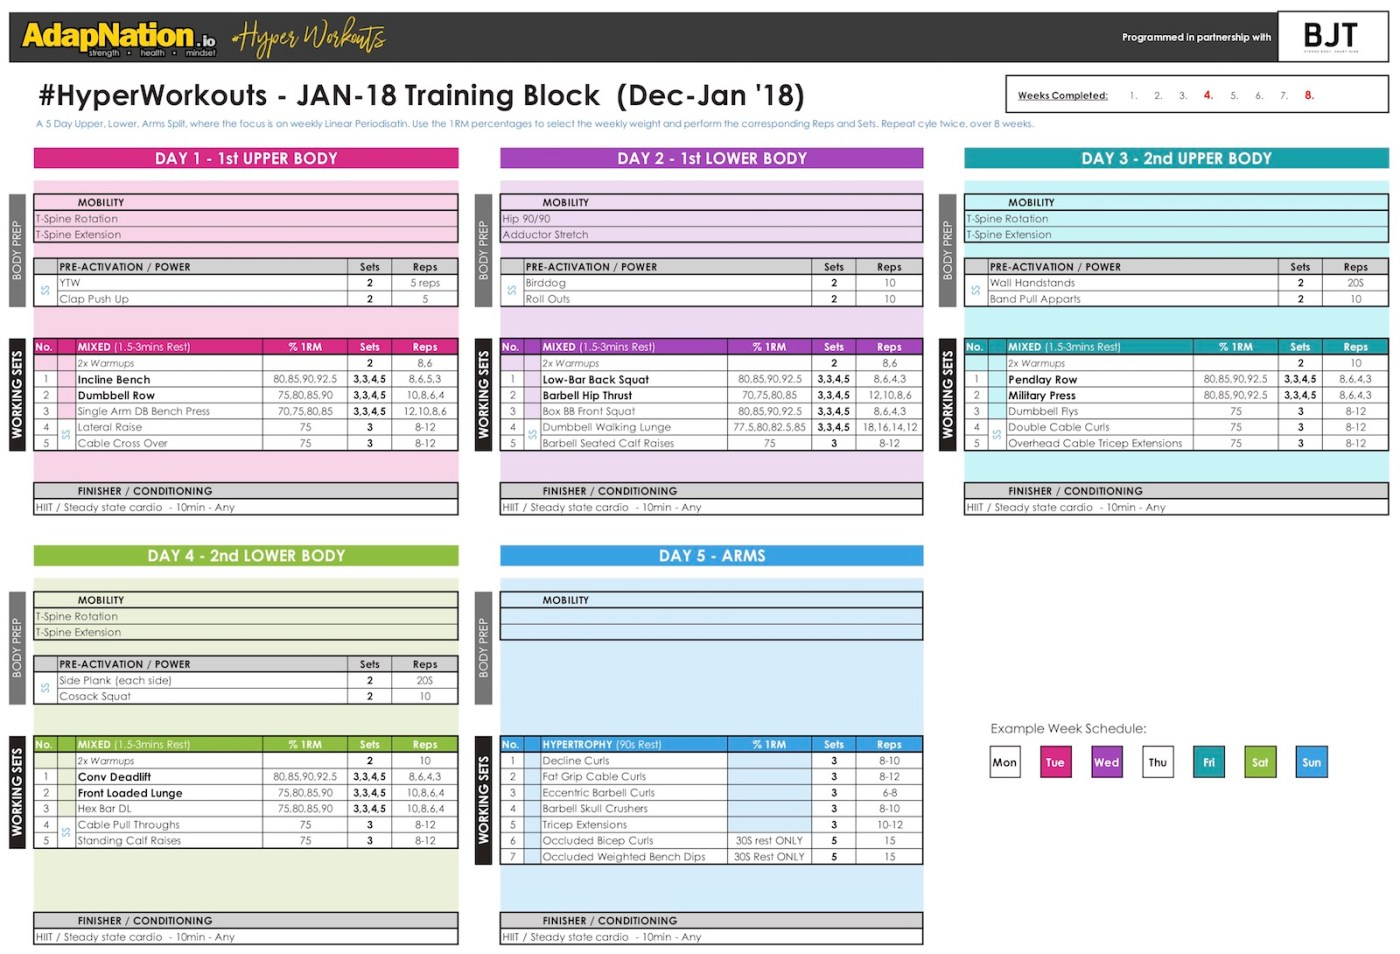 JAN-18 #HyperWorkouts Training Block